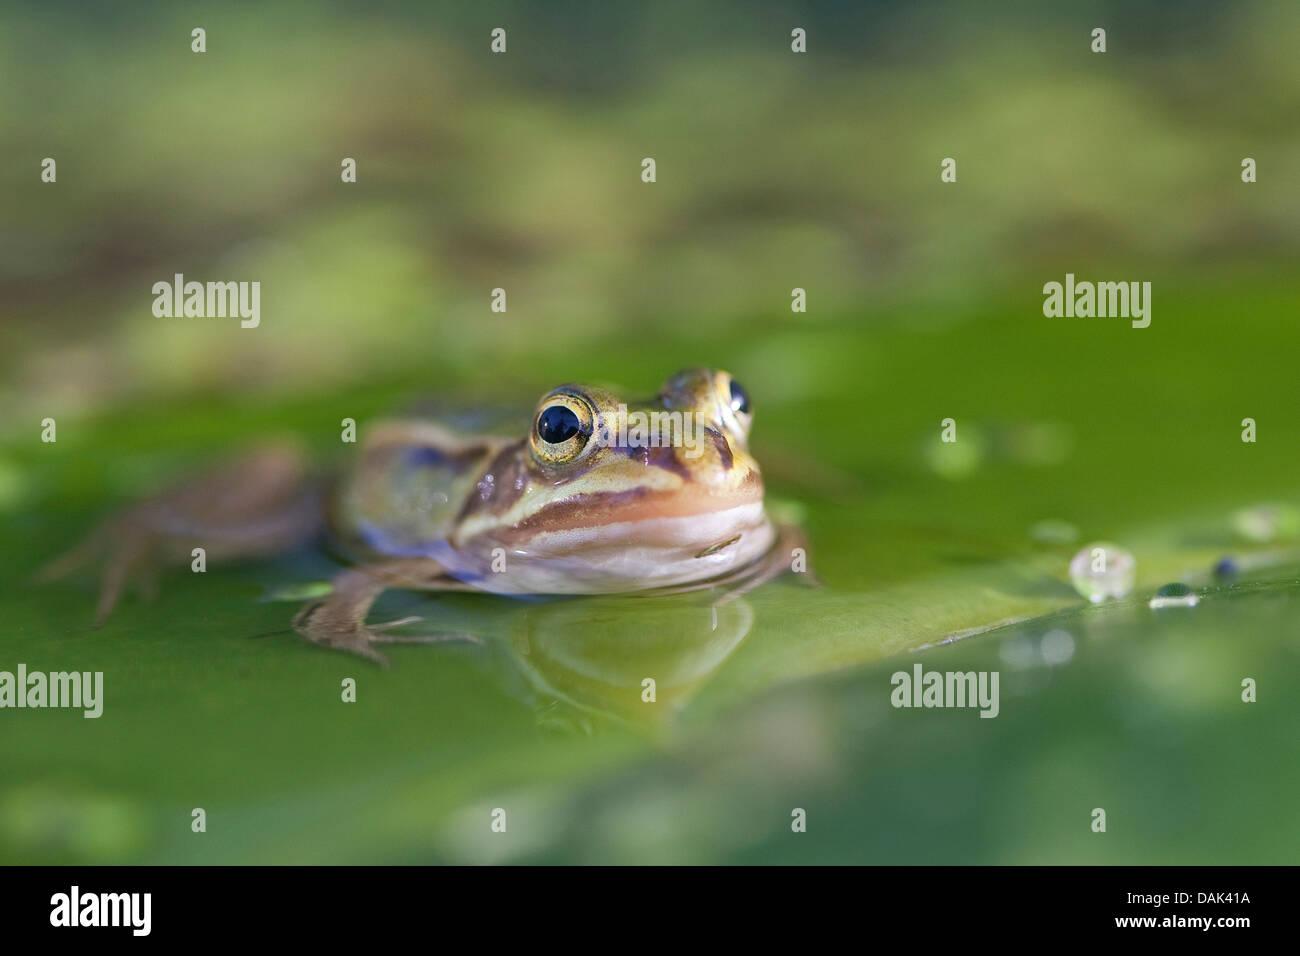 European edible frog, common edible frog (Rana kl. esculenta, Rana esculenta, Pelophylax esculentus), swimming, - Stock Image